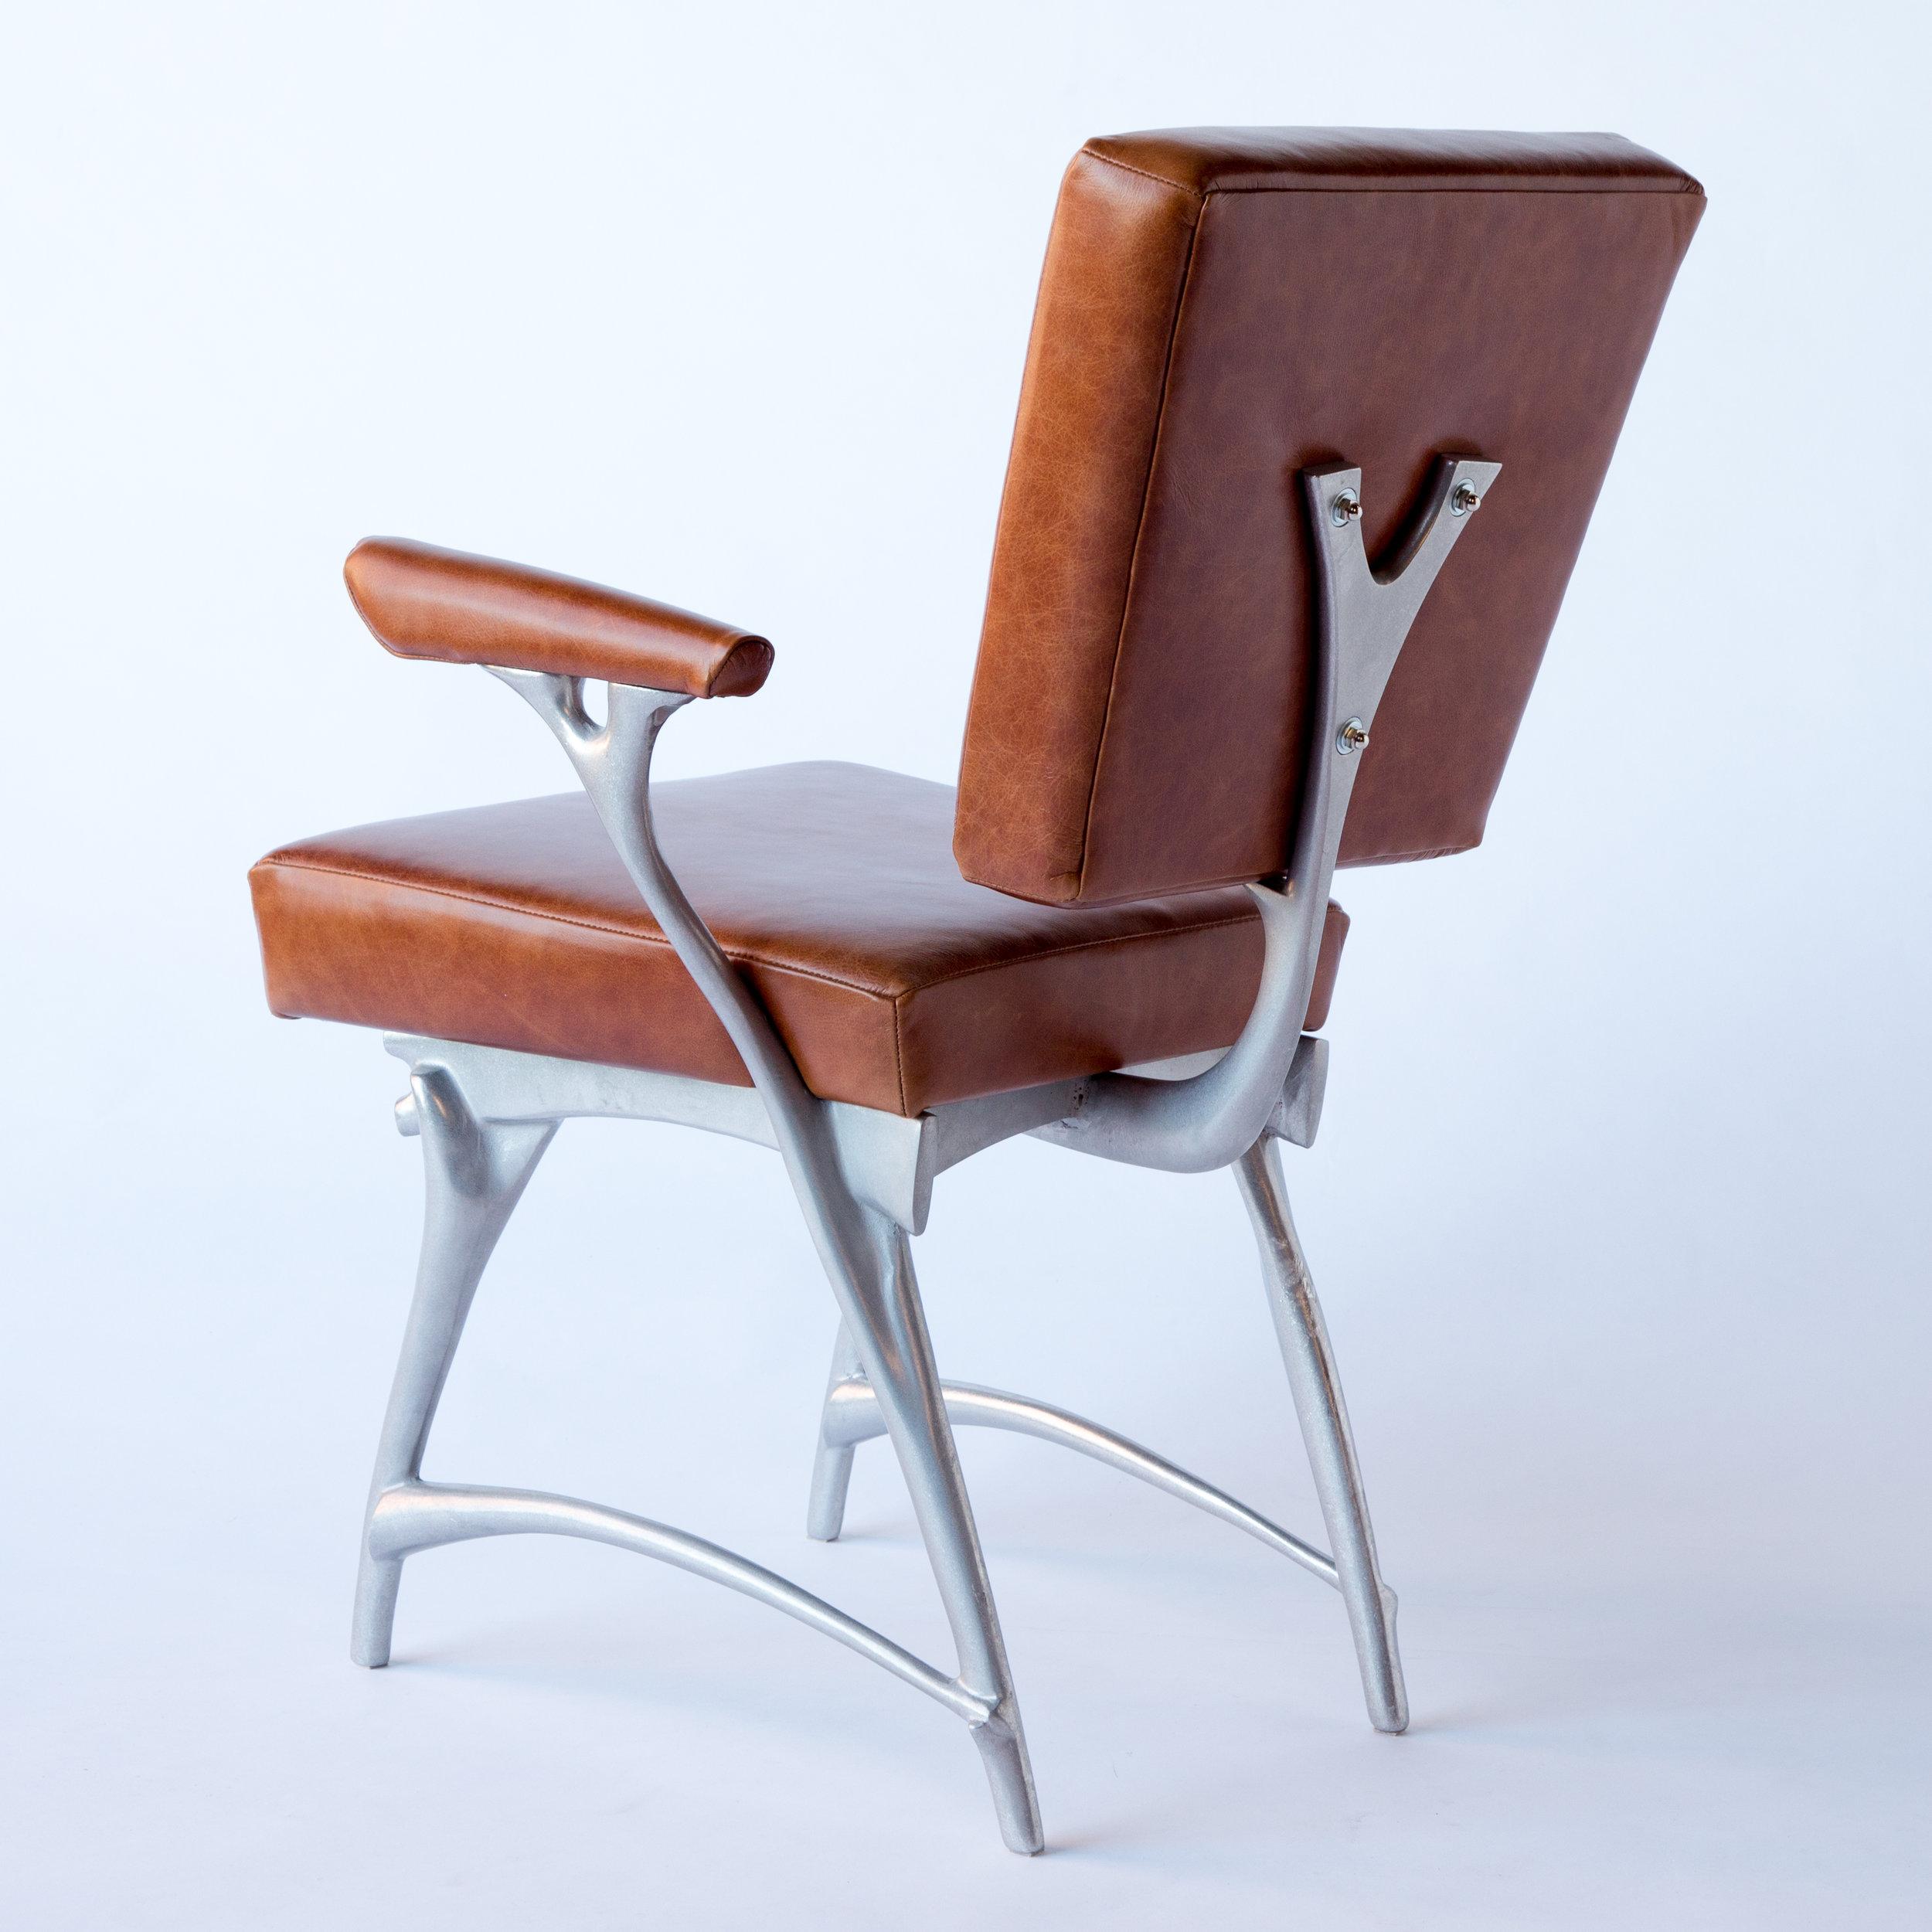 Twig Chair Light-8.jpg